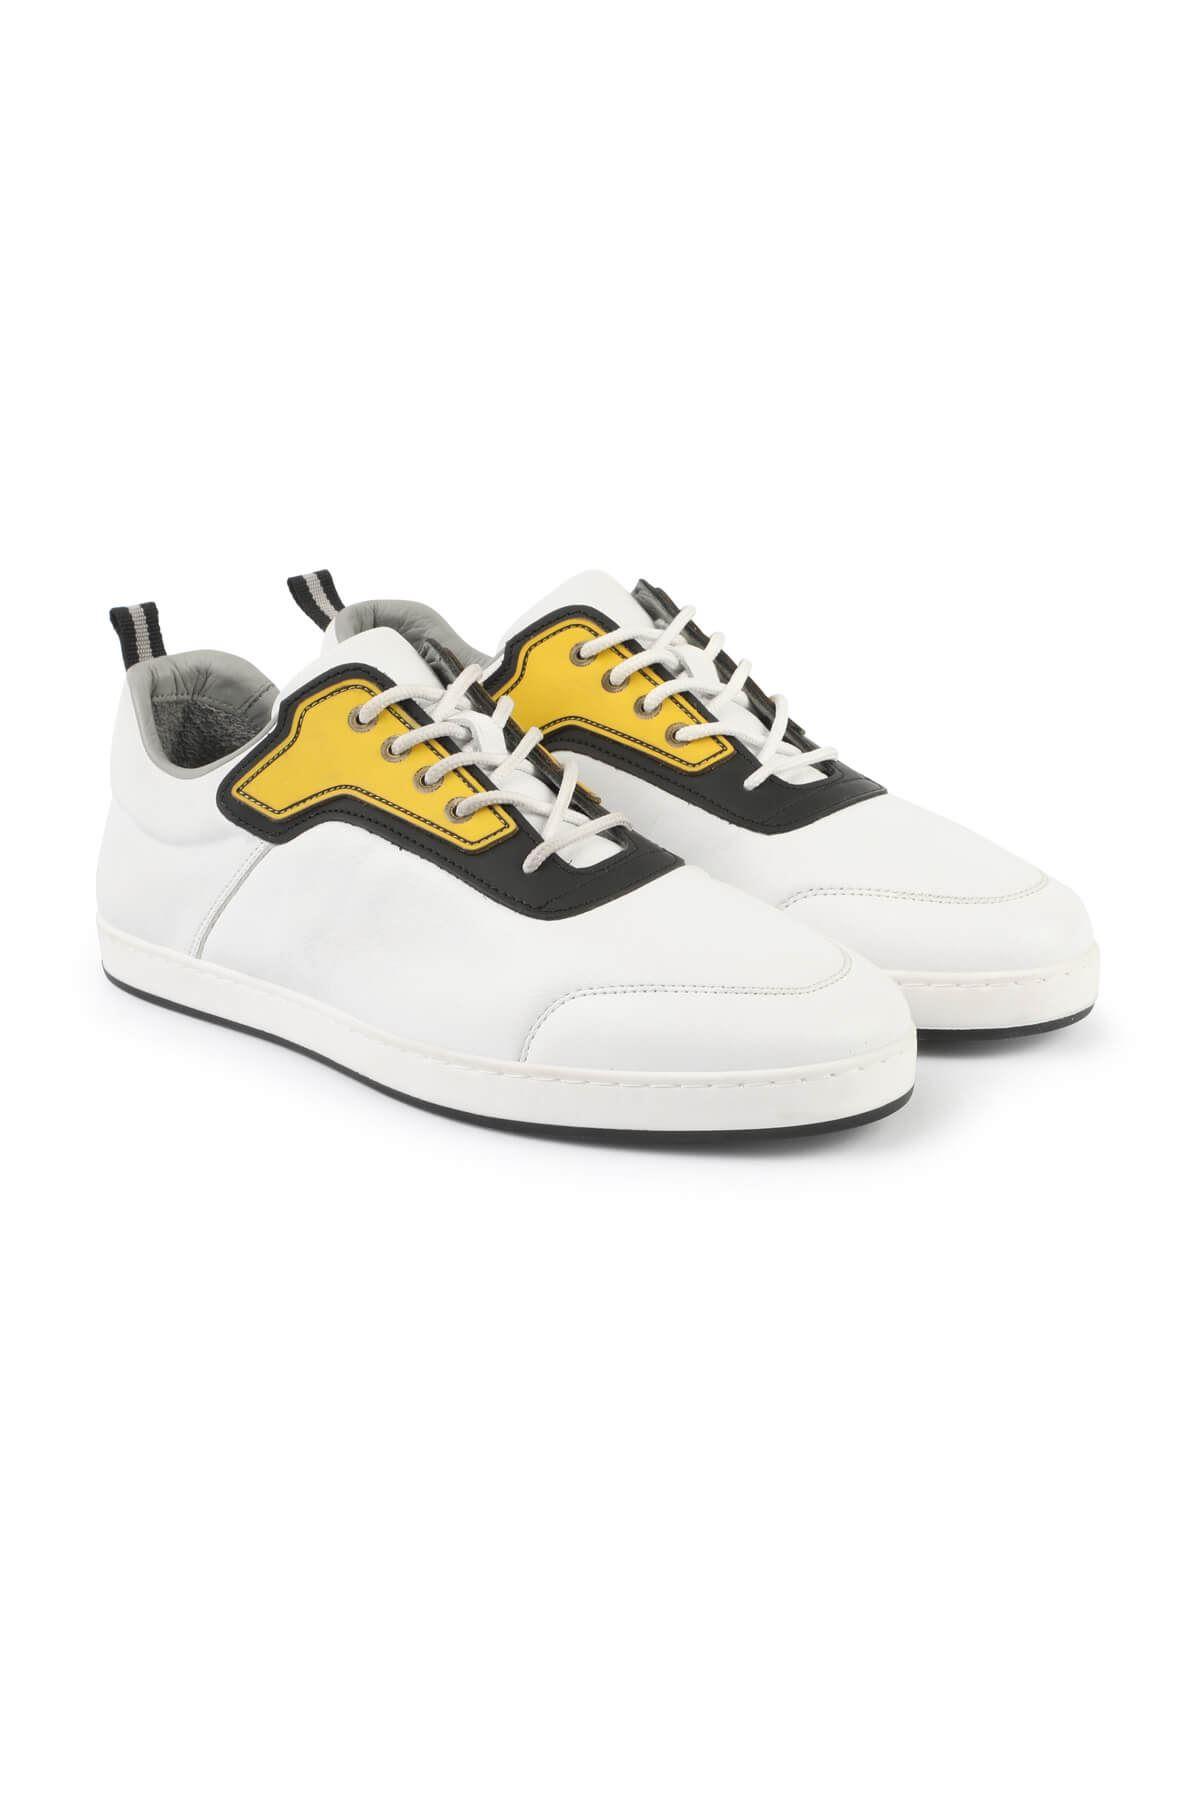 Libero 3105 White Sneaker Shoes